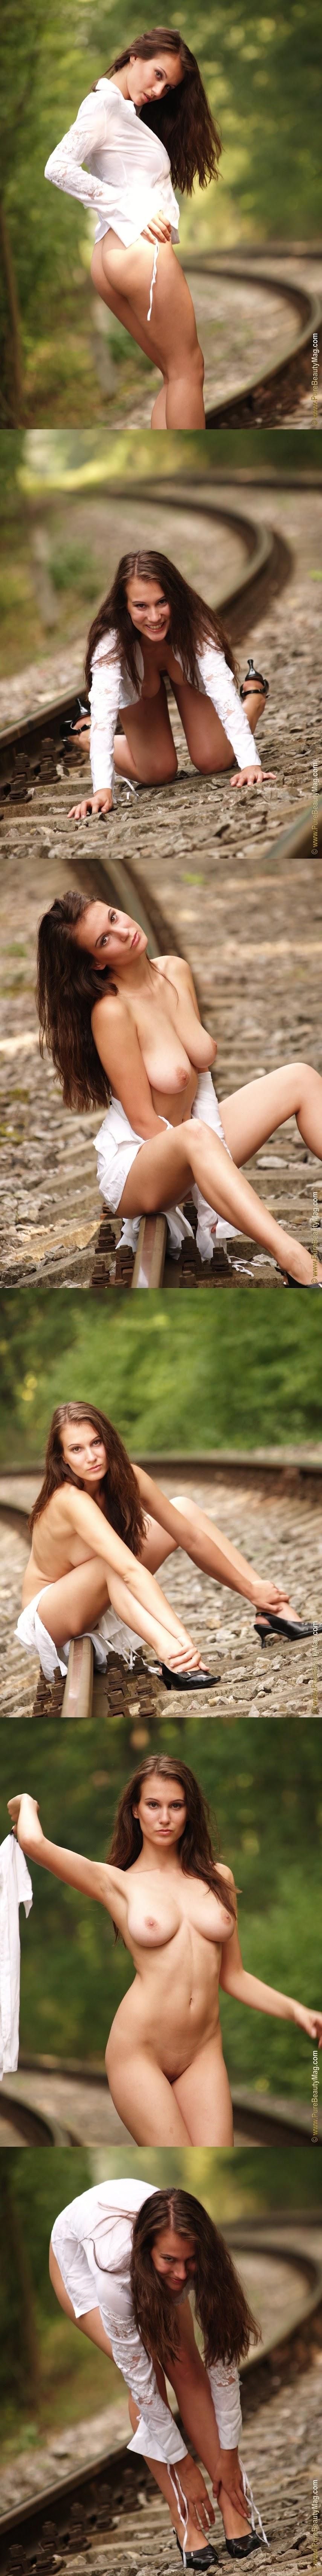 PureBeautyMag PBM  - 2005-10-15 - #s131912 - Veronika Stefan - Bride to be - 2560px - idols